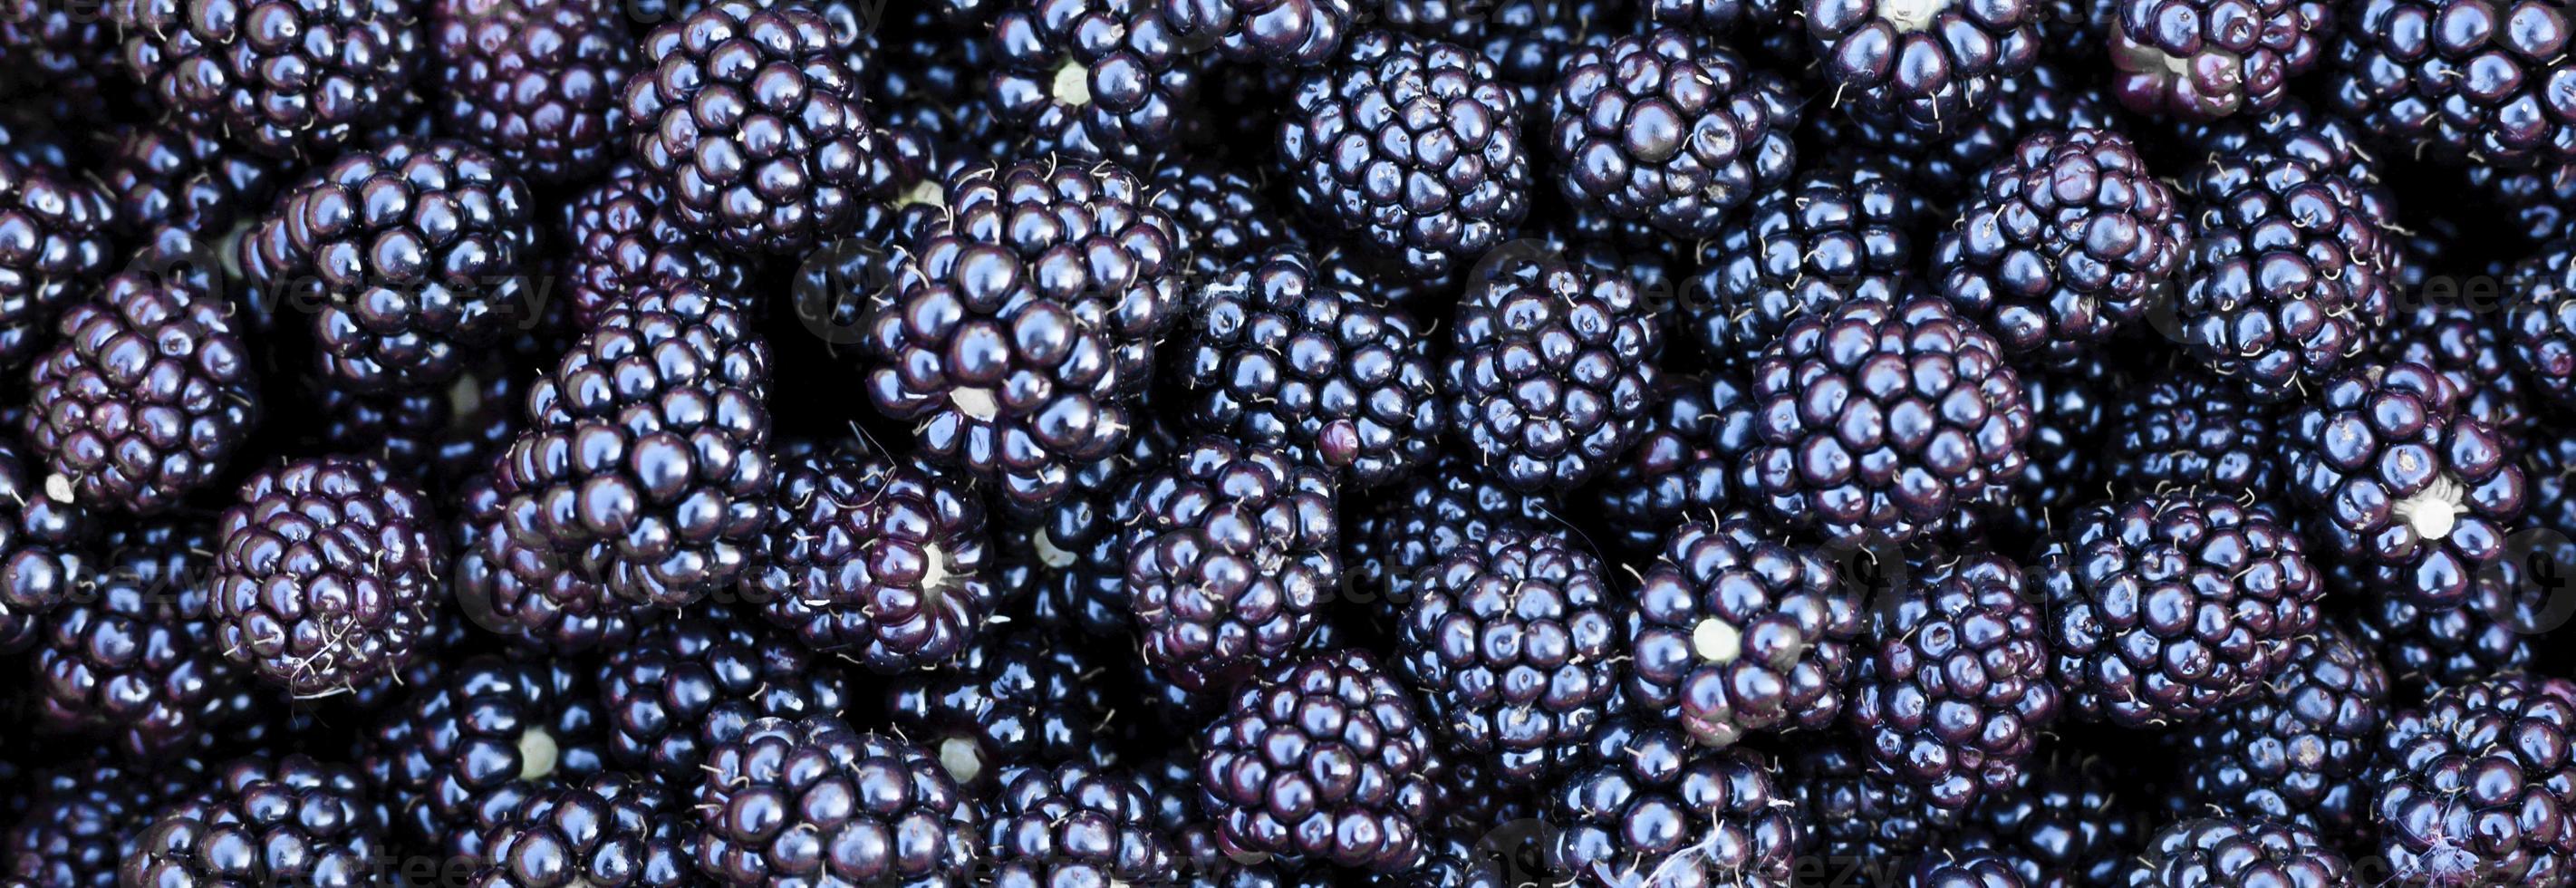 Ripe wild blackberries background photo